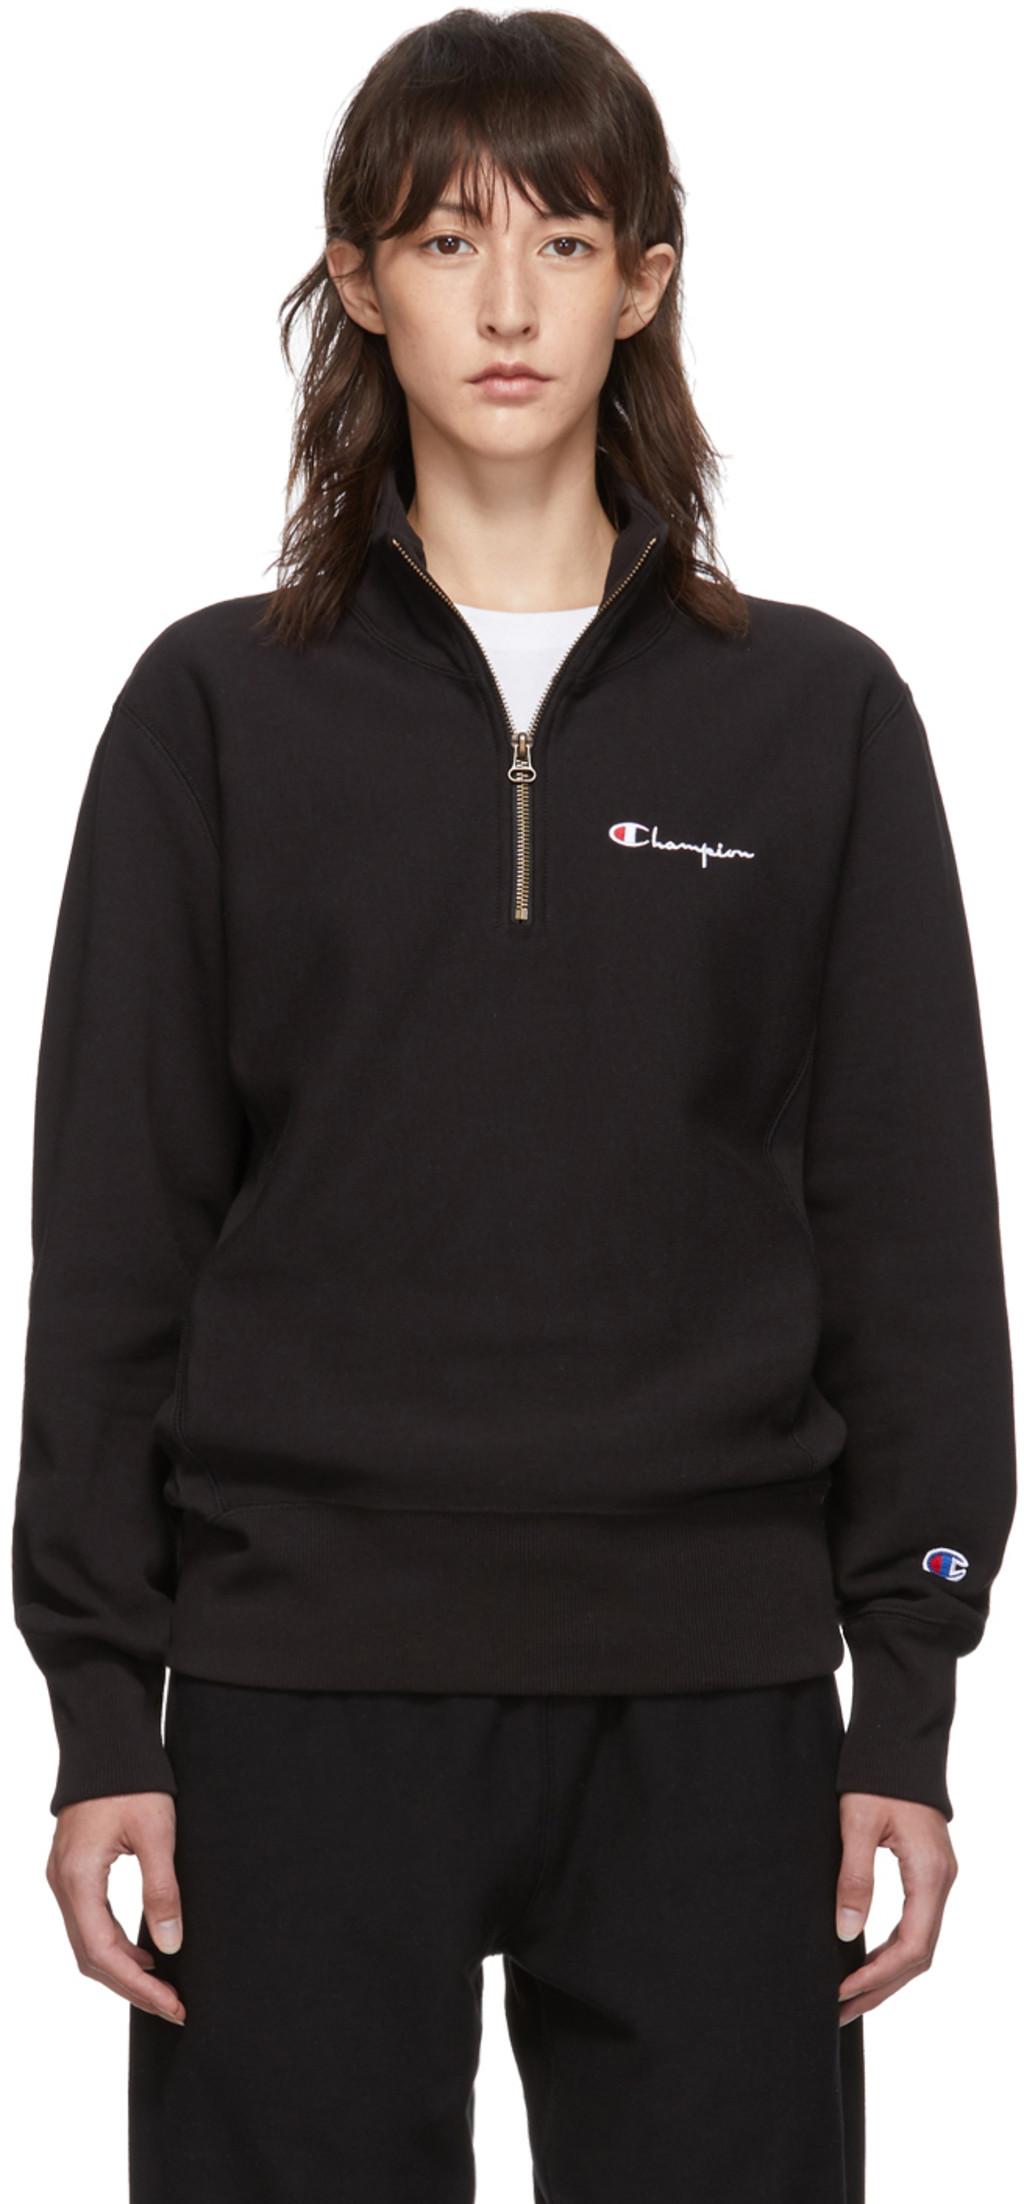 Script Sweatshirt Zip Half Small Black 2YWEIDH9